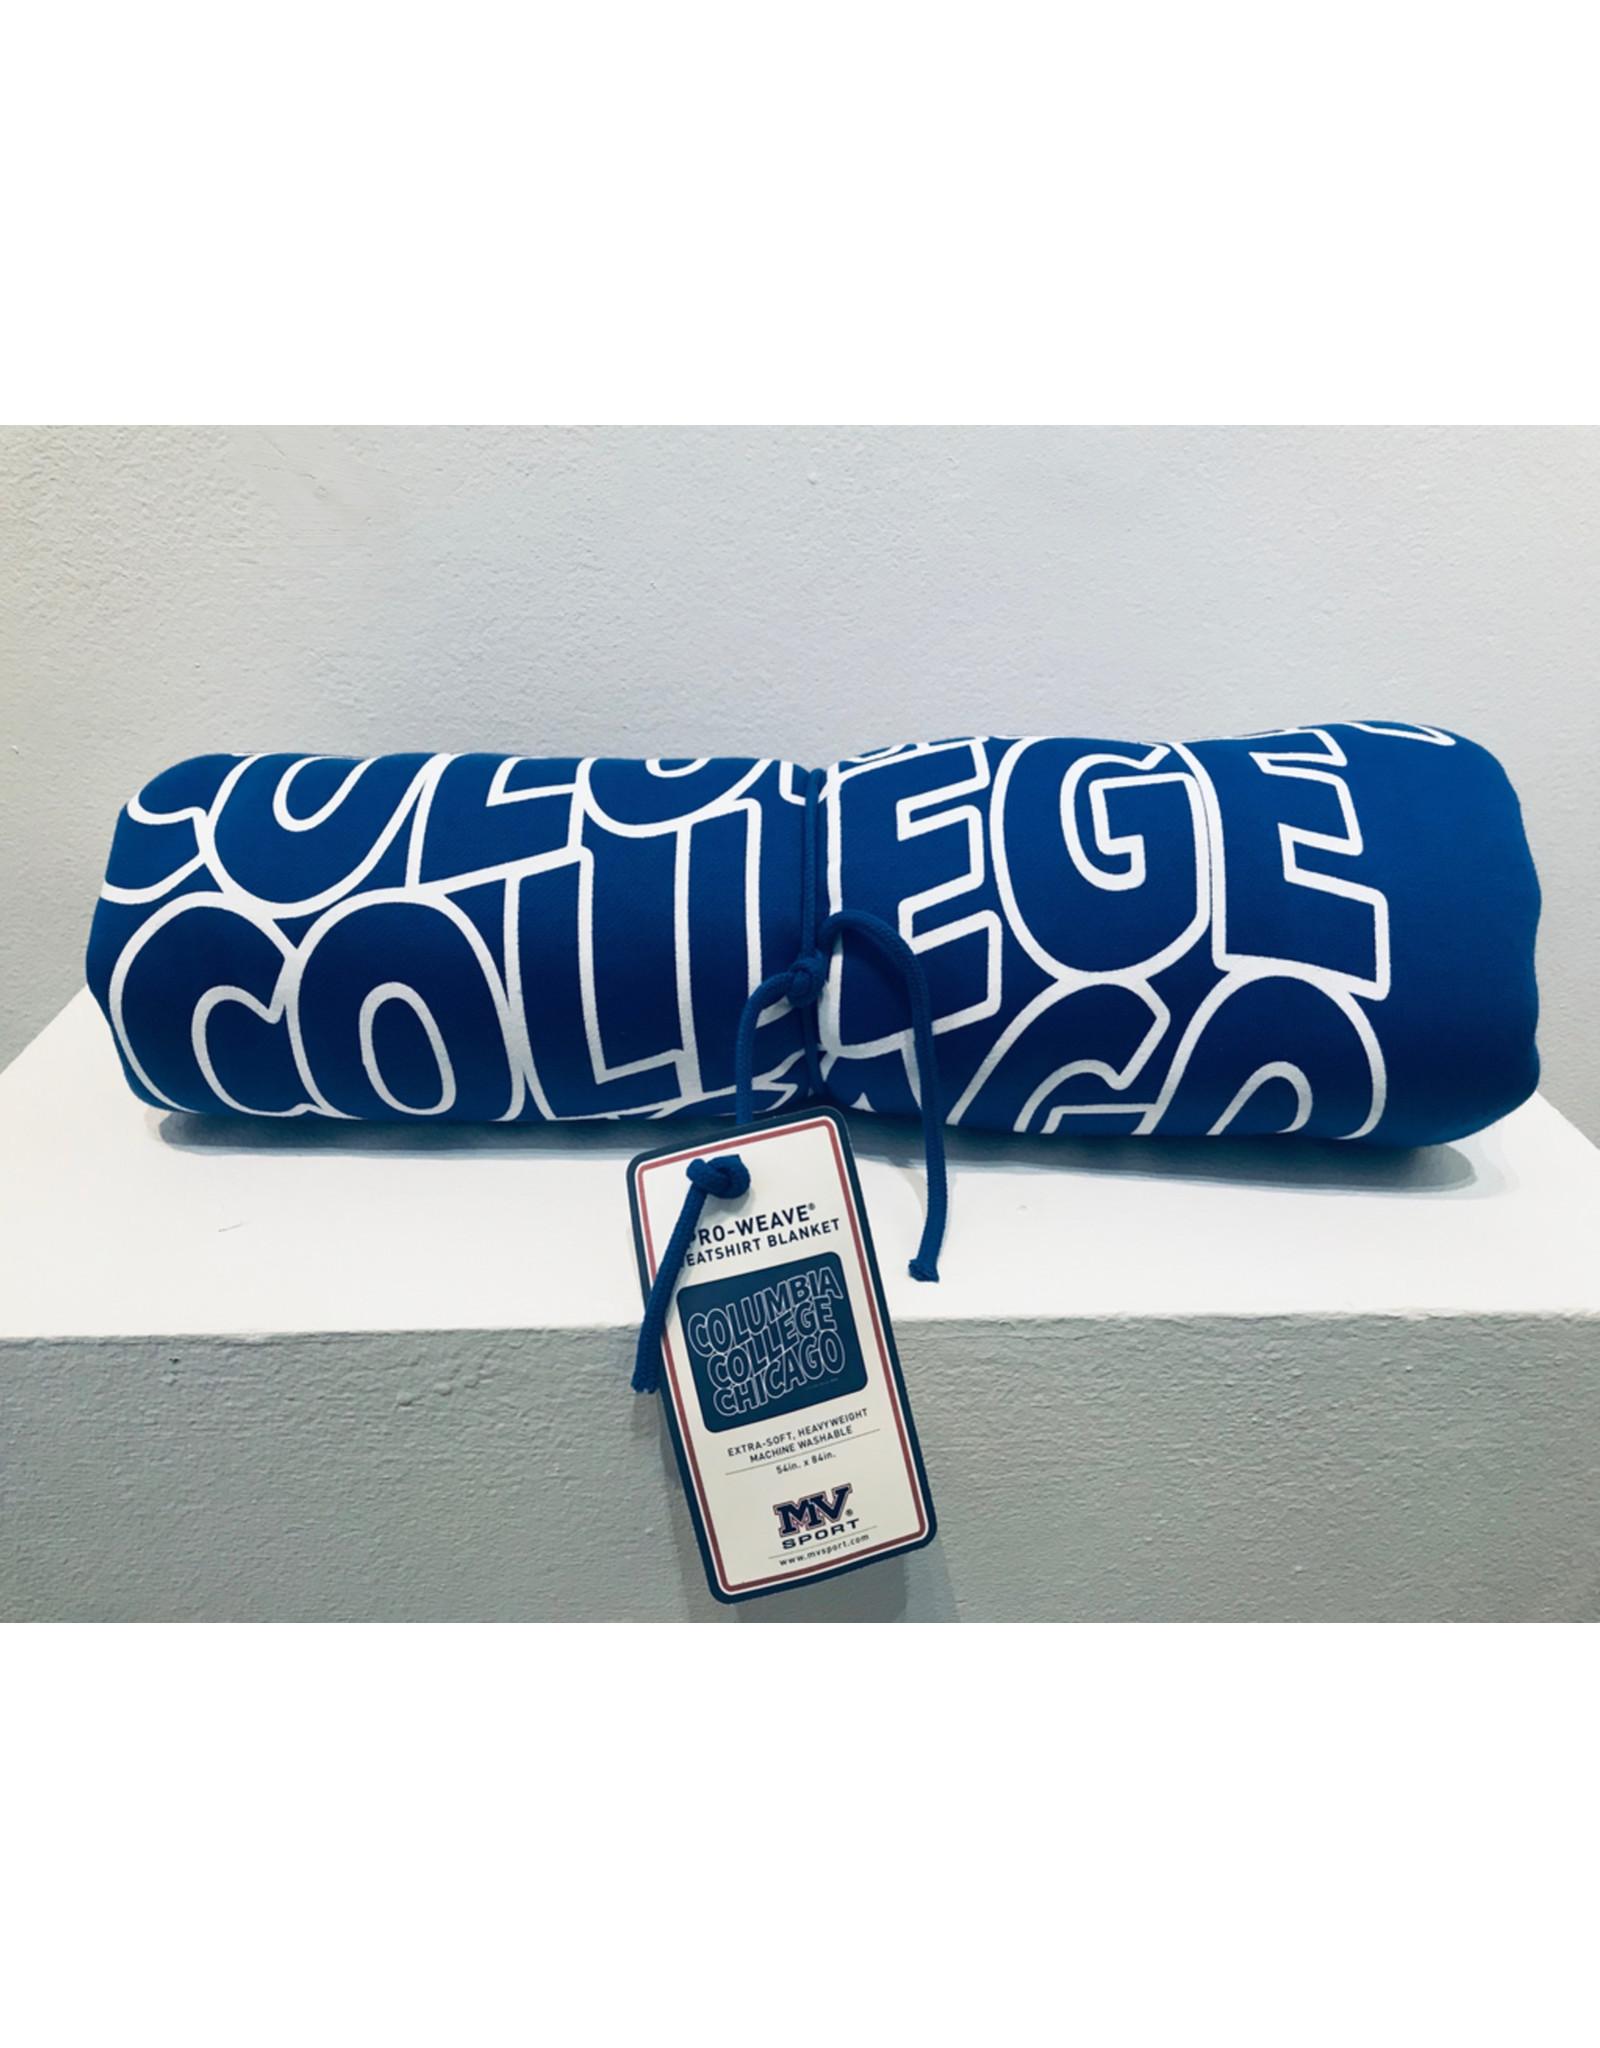 Buy Columbia, By Columbia Columbia College Chicago Sweatshirt Blanket in Hyper Blue - Buy Columbia, By Columbia